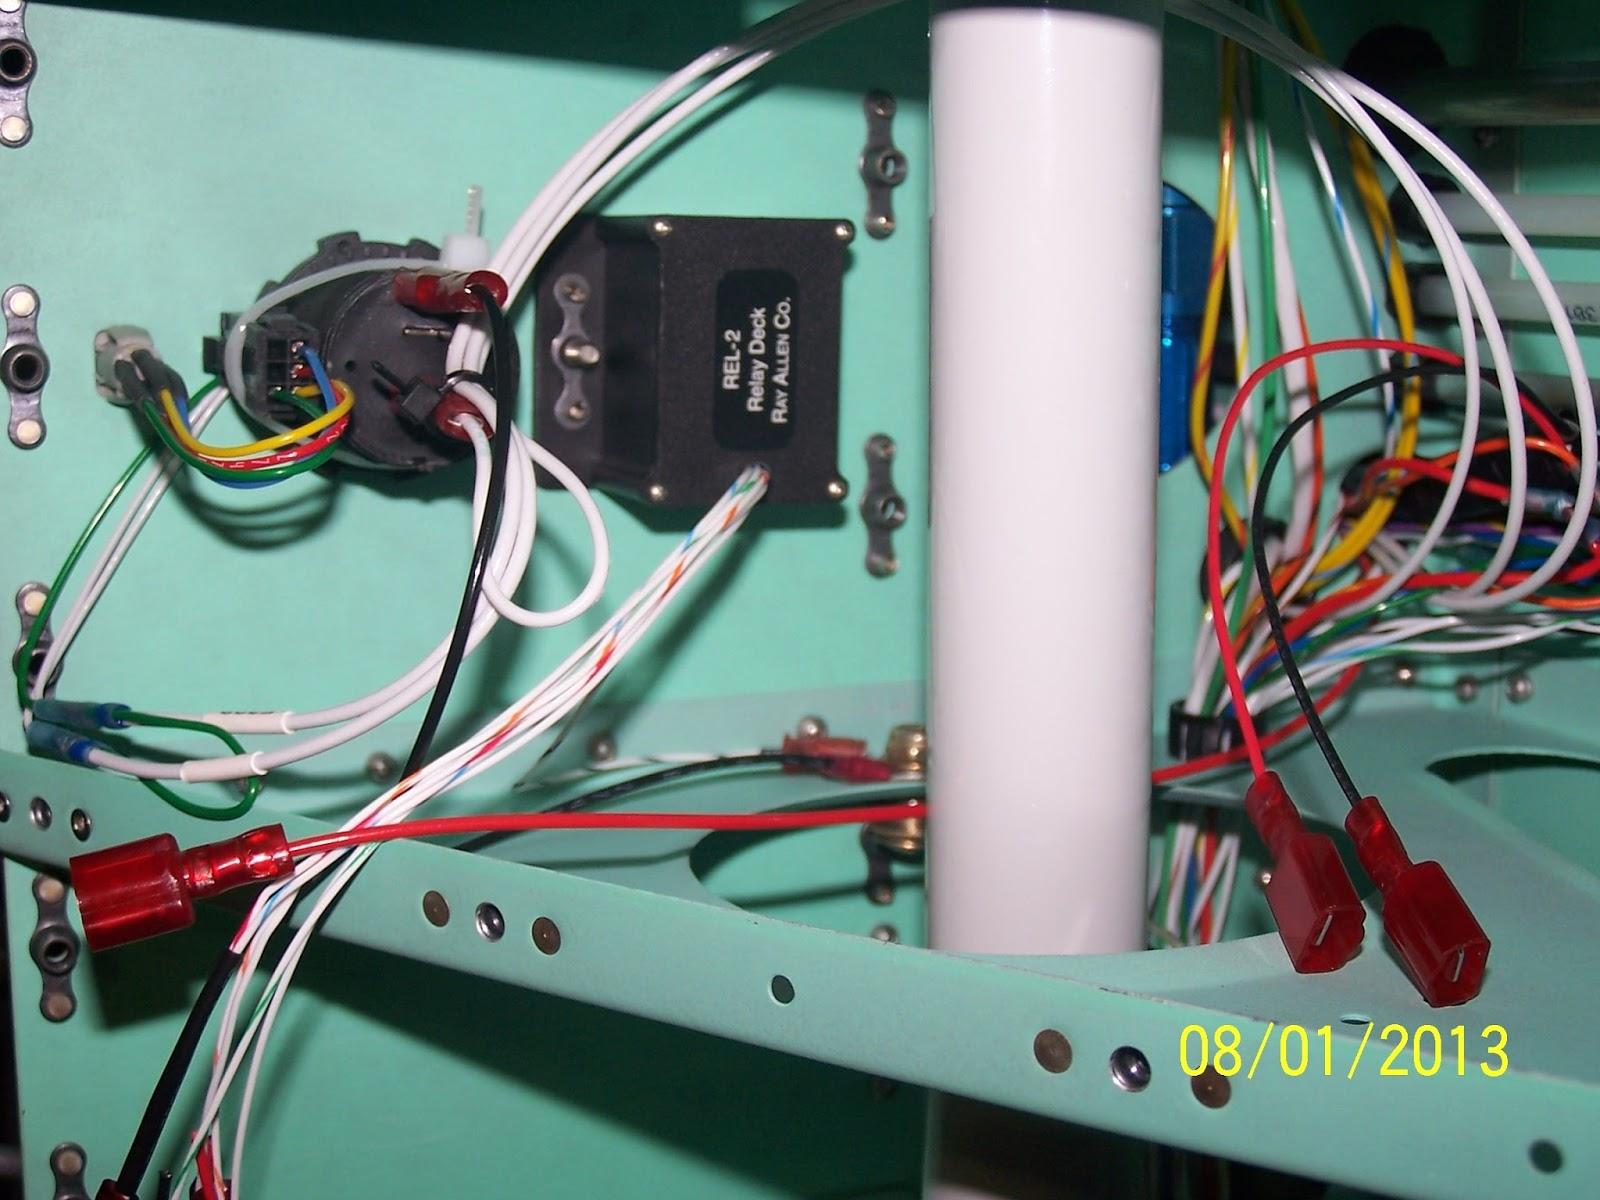 RV-12 N79AM: Fuselage Wiring Harness, Part 2